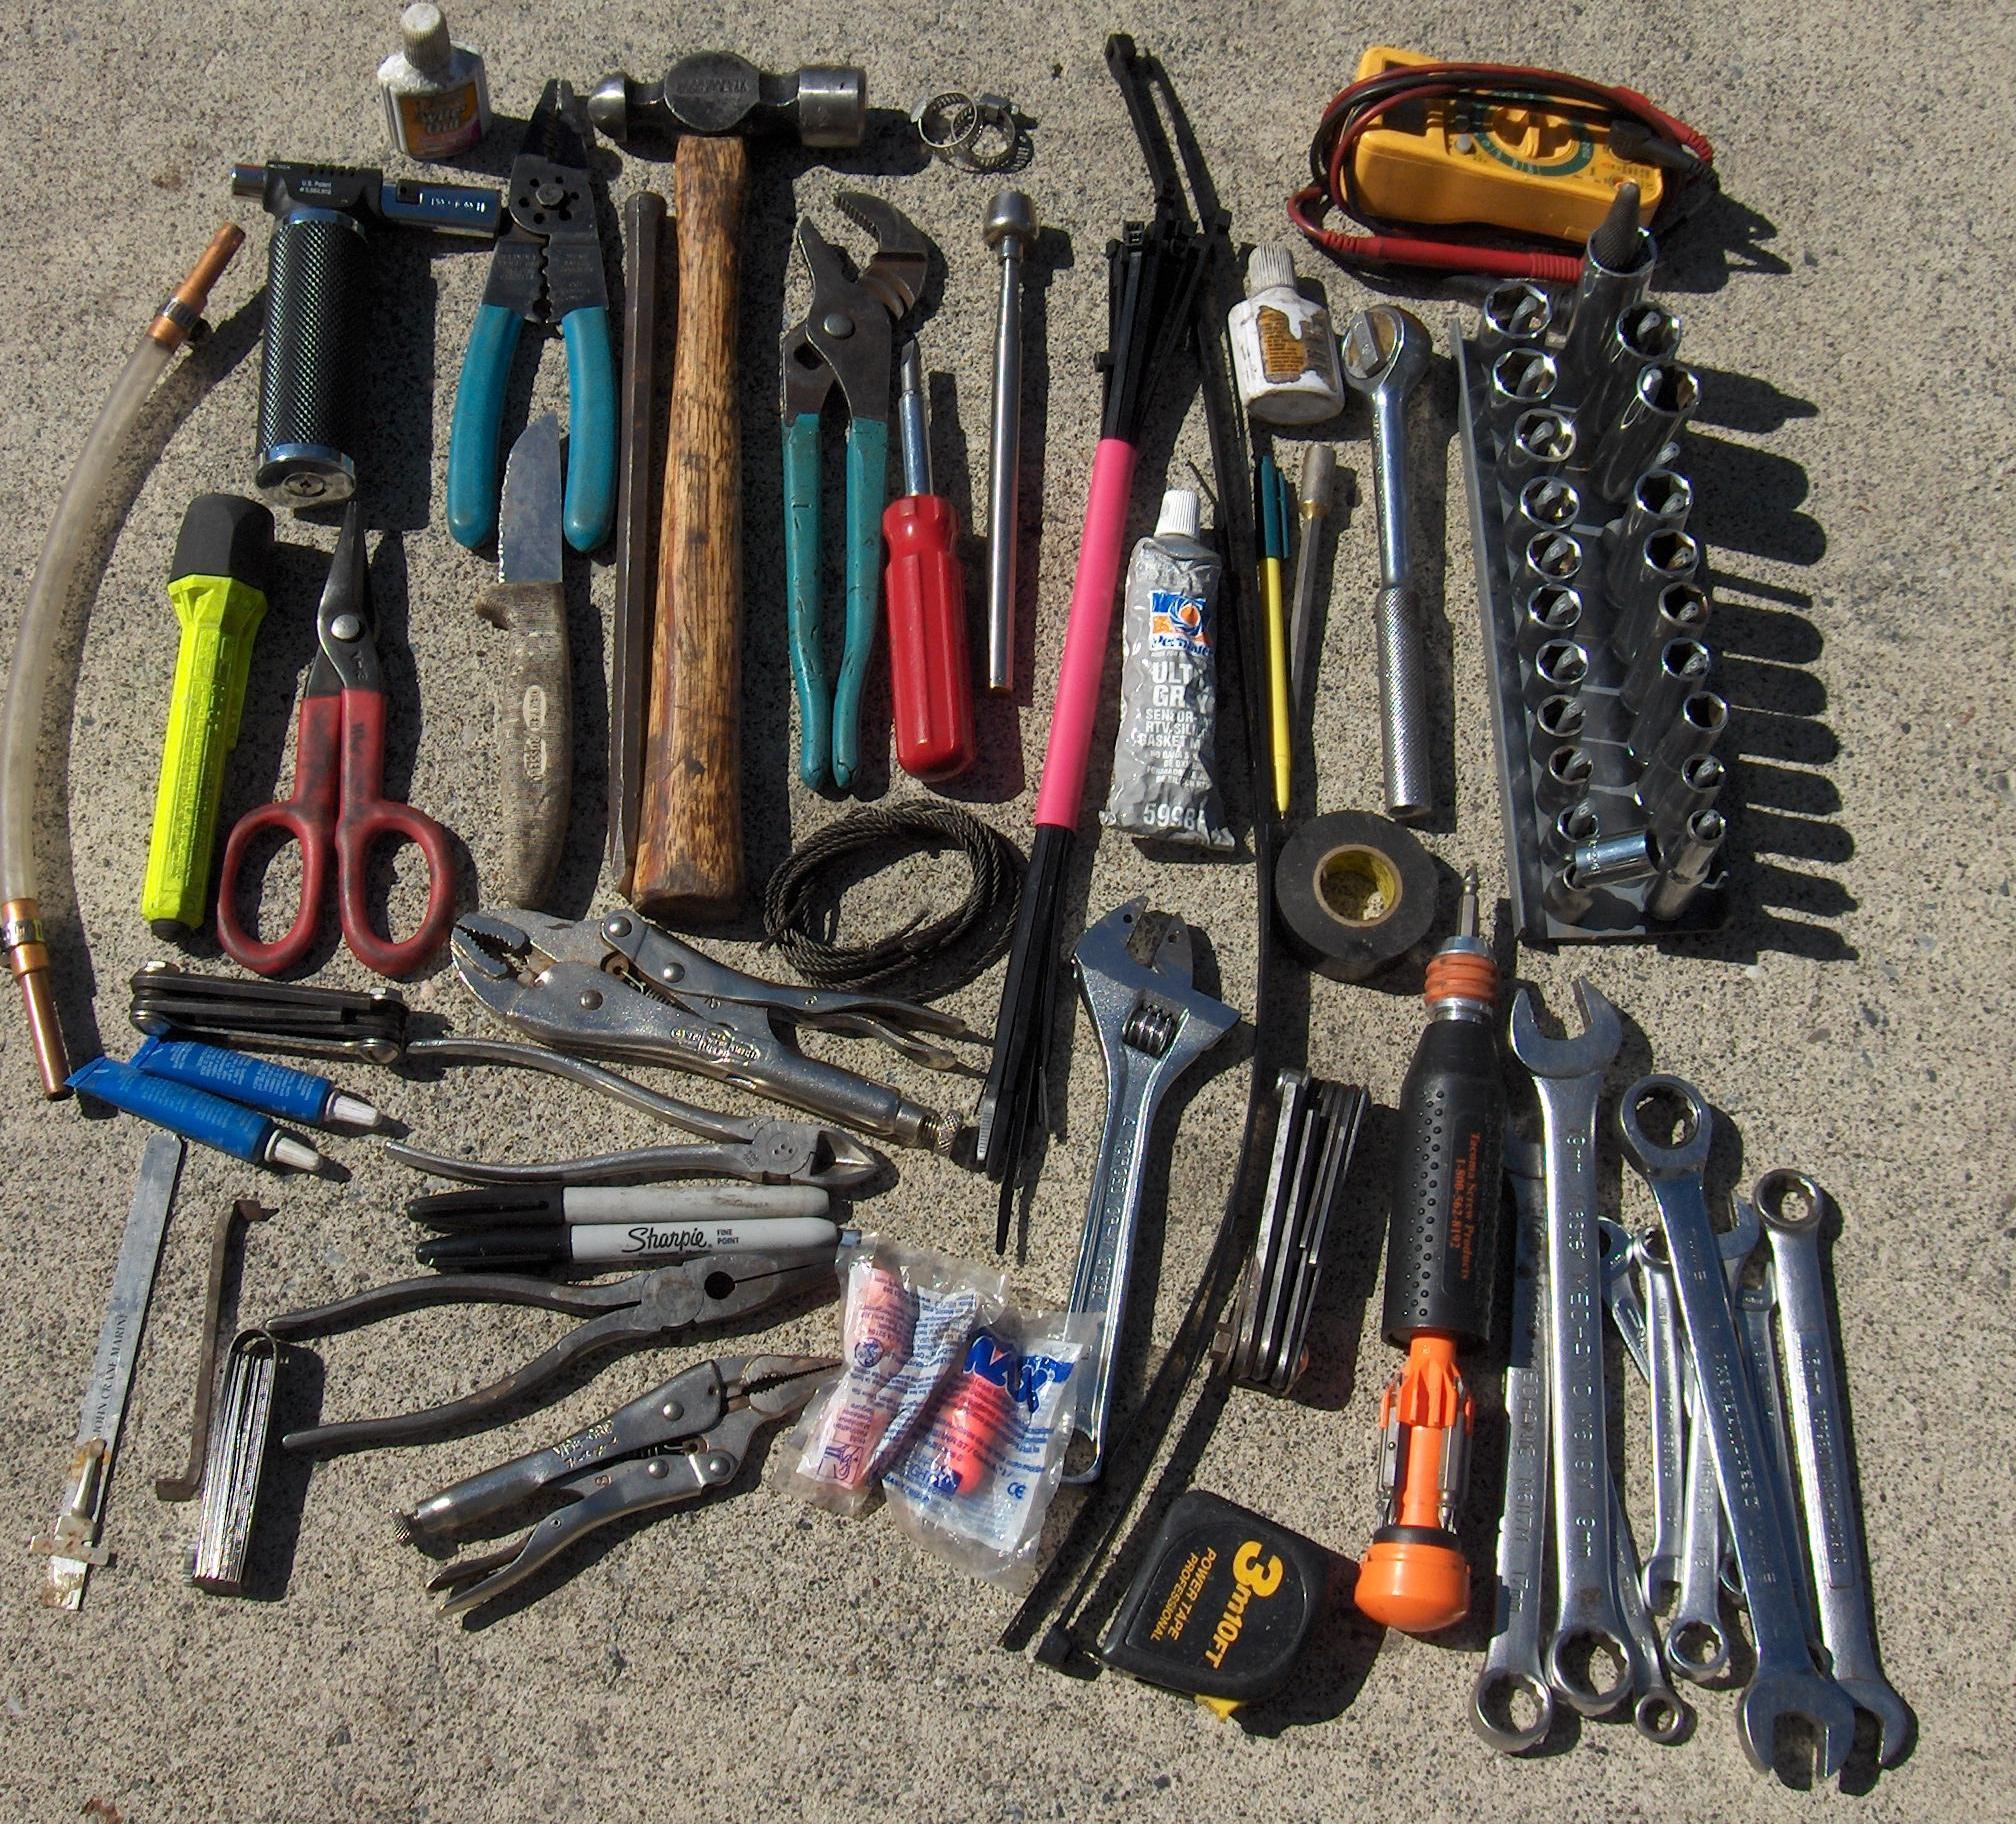 Tools for Normal Bilge Pumps